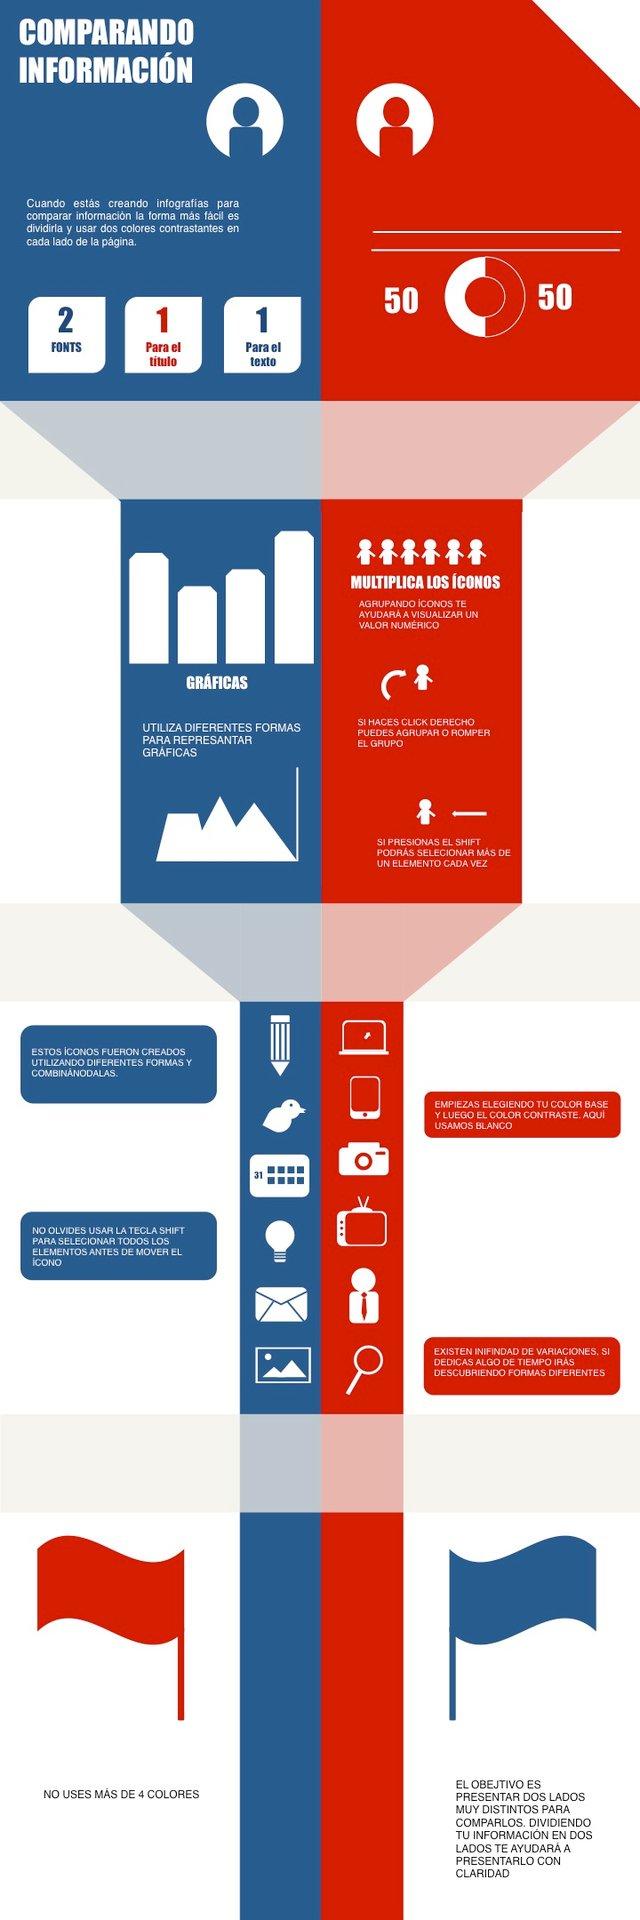 plantillas gratis para diseñar infografías en Power Point